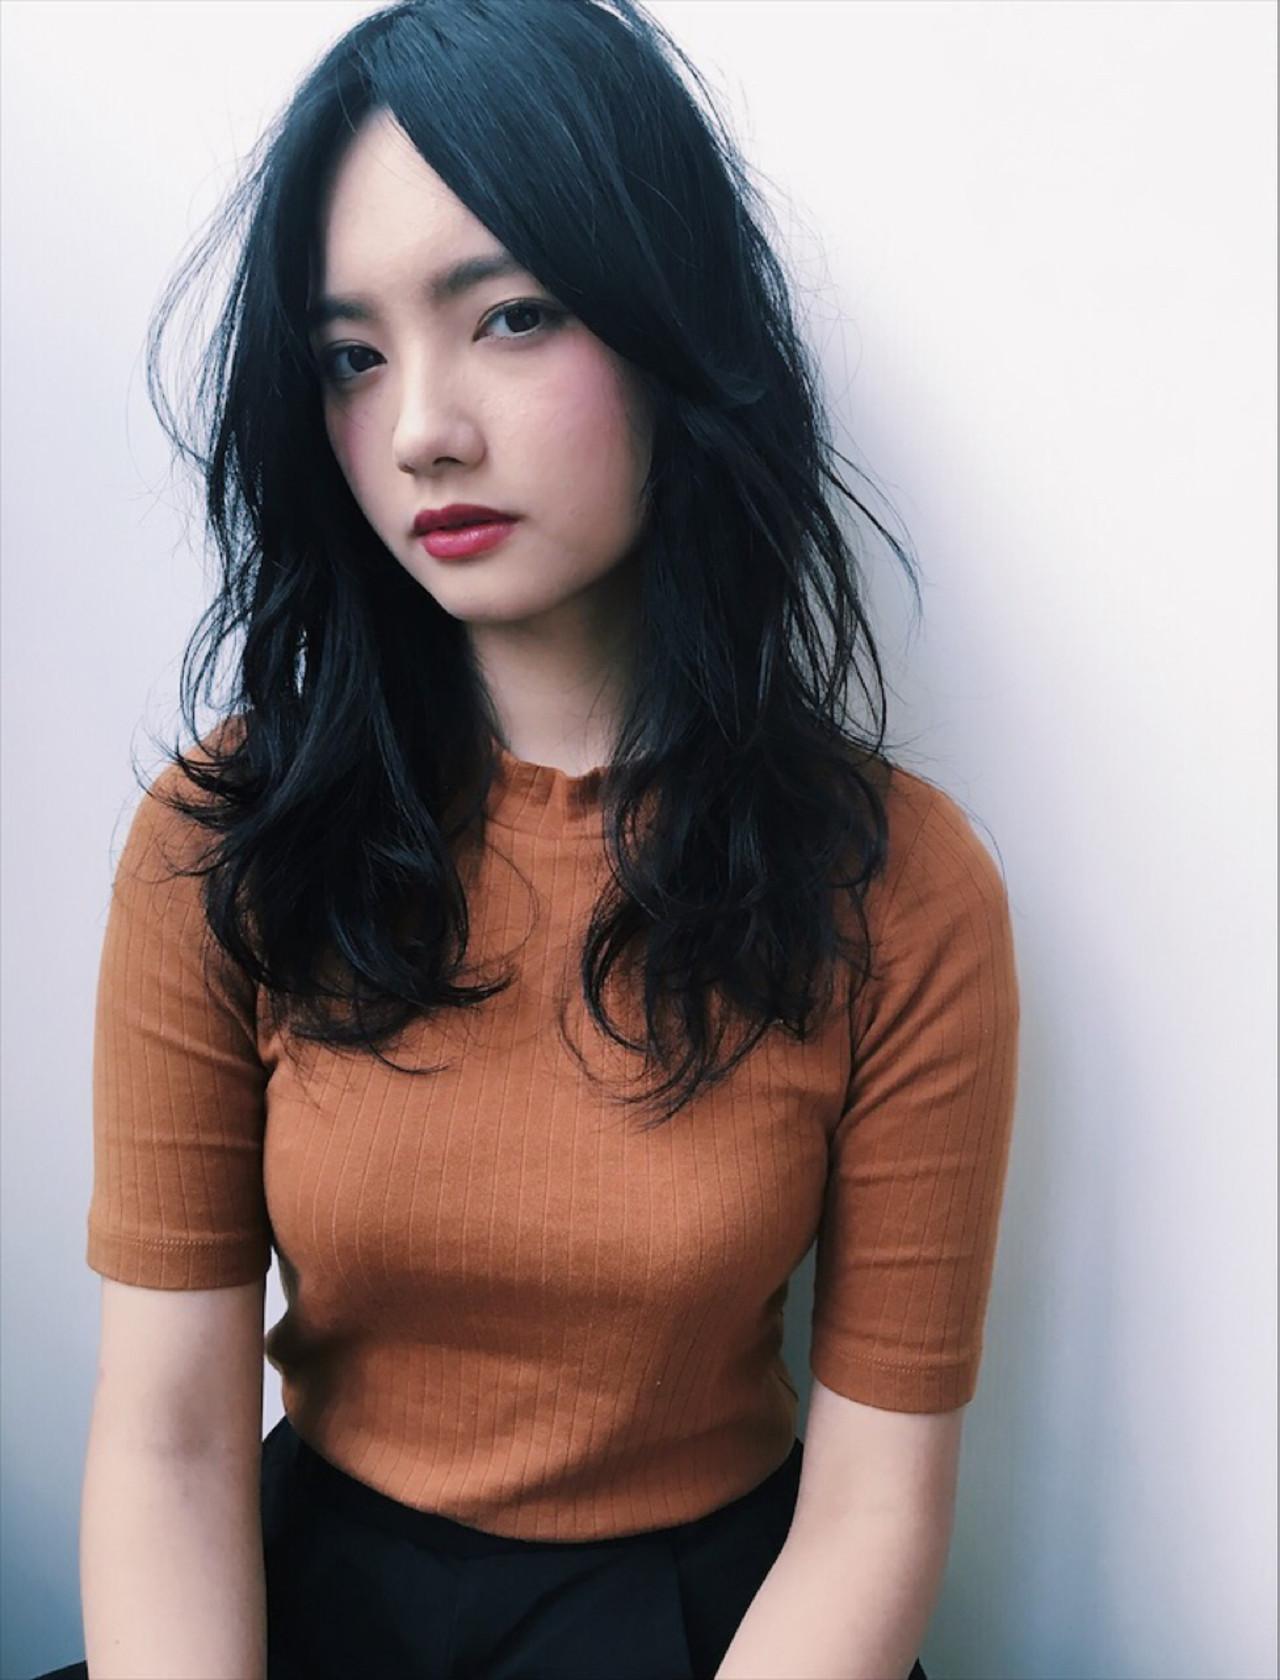 SEXY&CUTEな女子急増中!キーワードは「黒髪×パーマ」 吉川 ミチオ